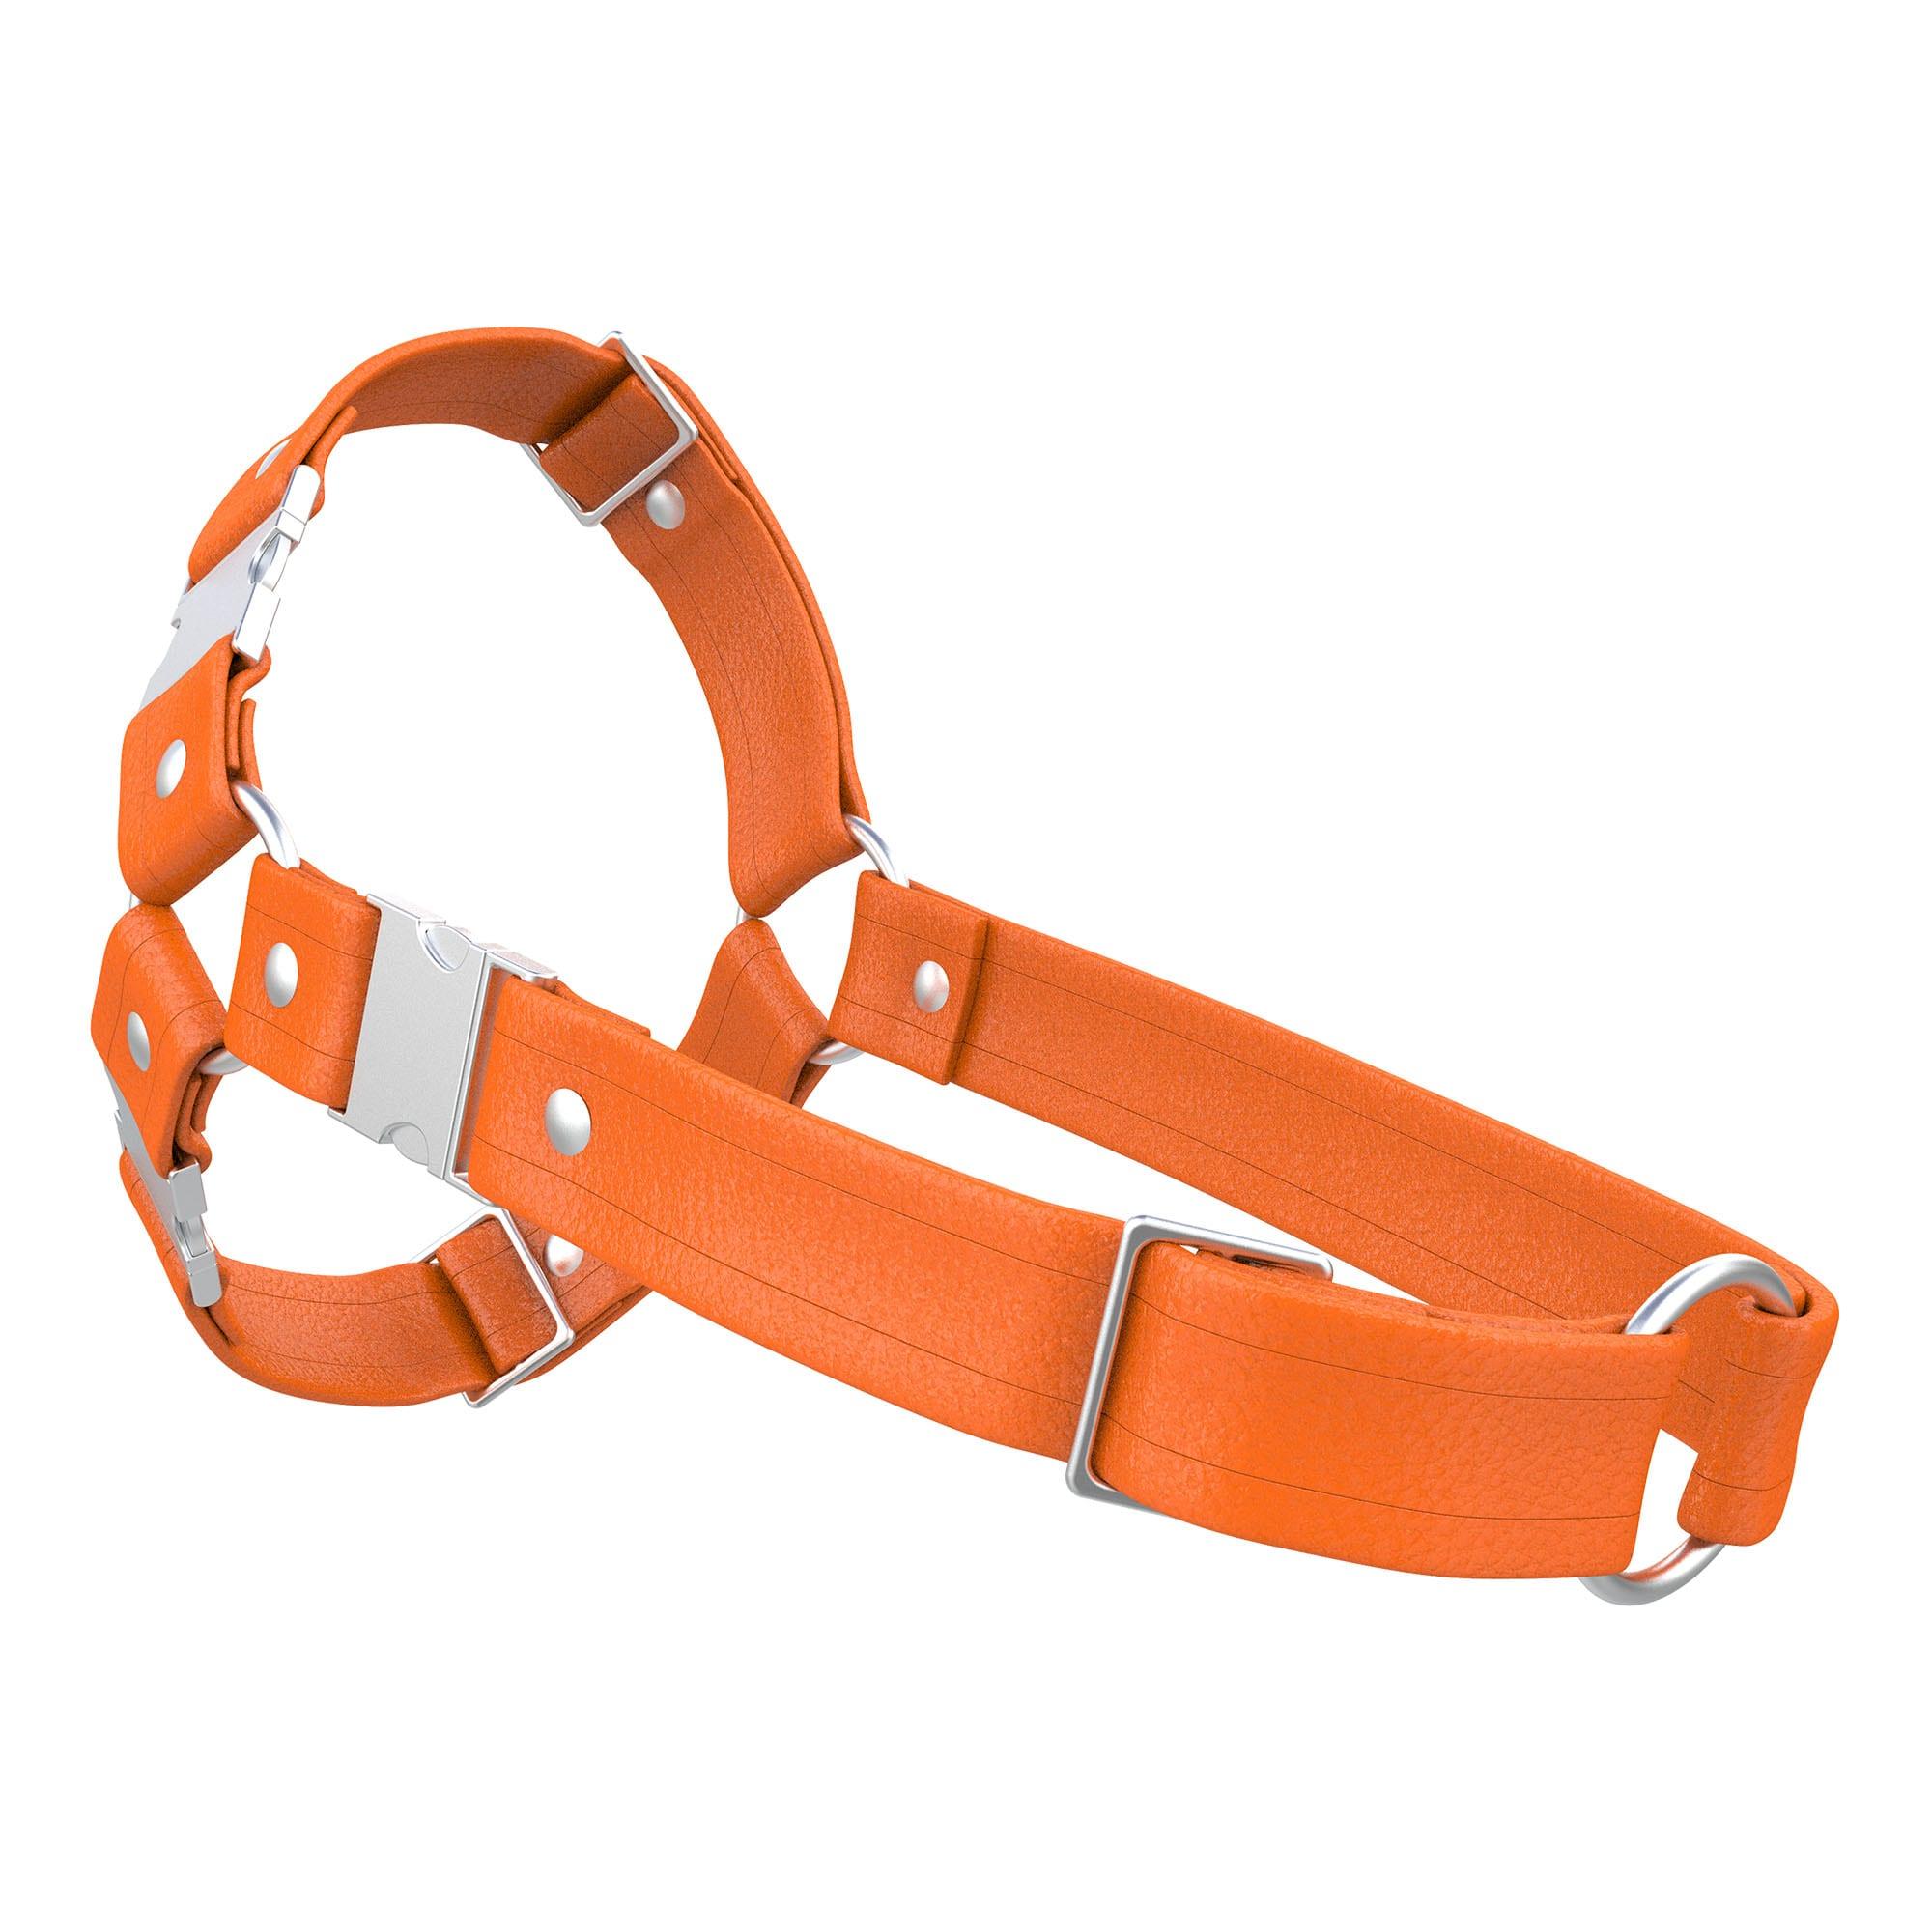 One Size Spartan Harness – Standard Leather – Orange - Silver Metal Fittings